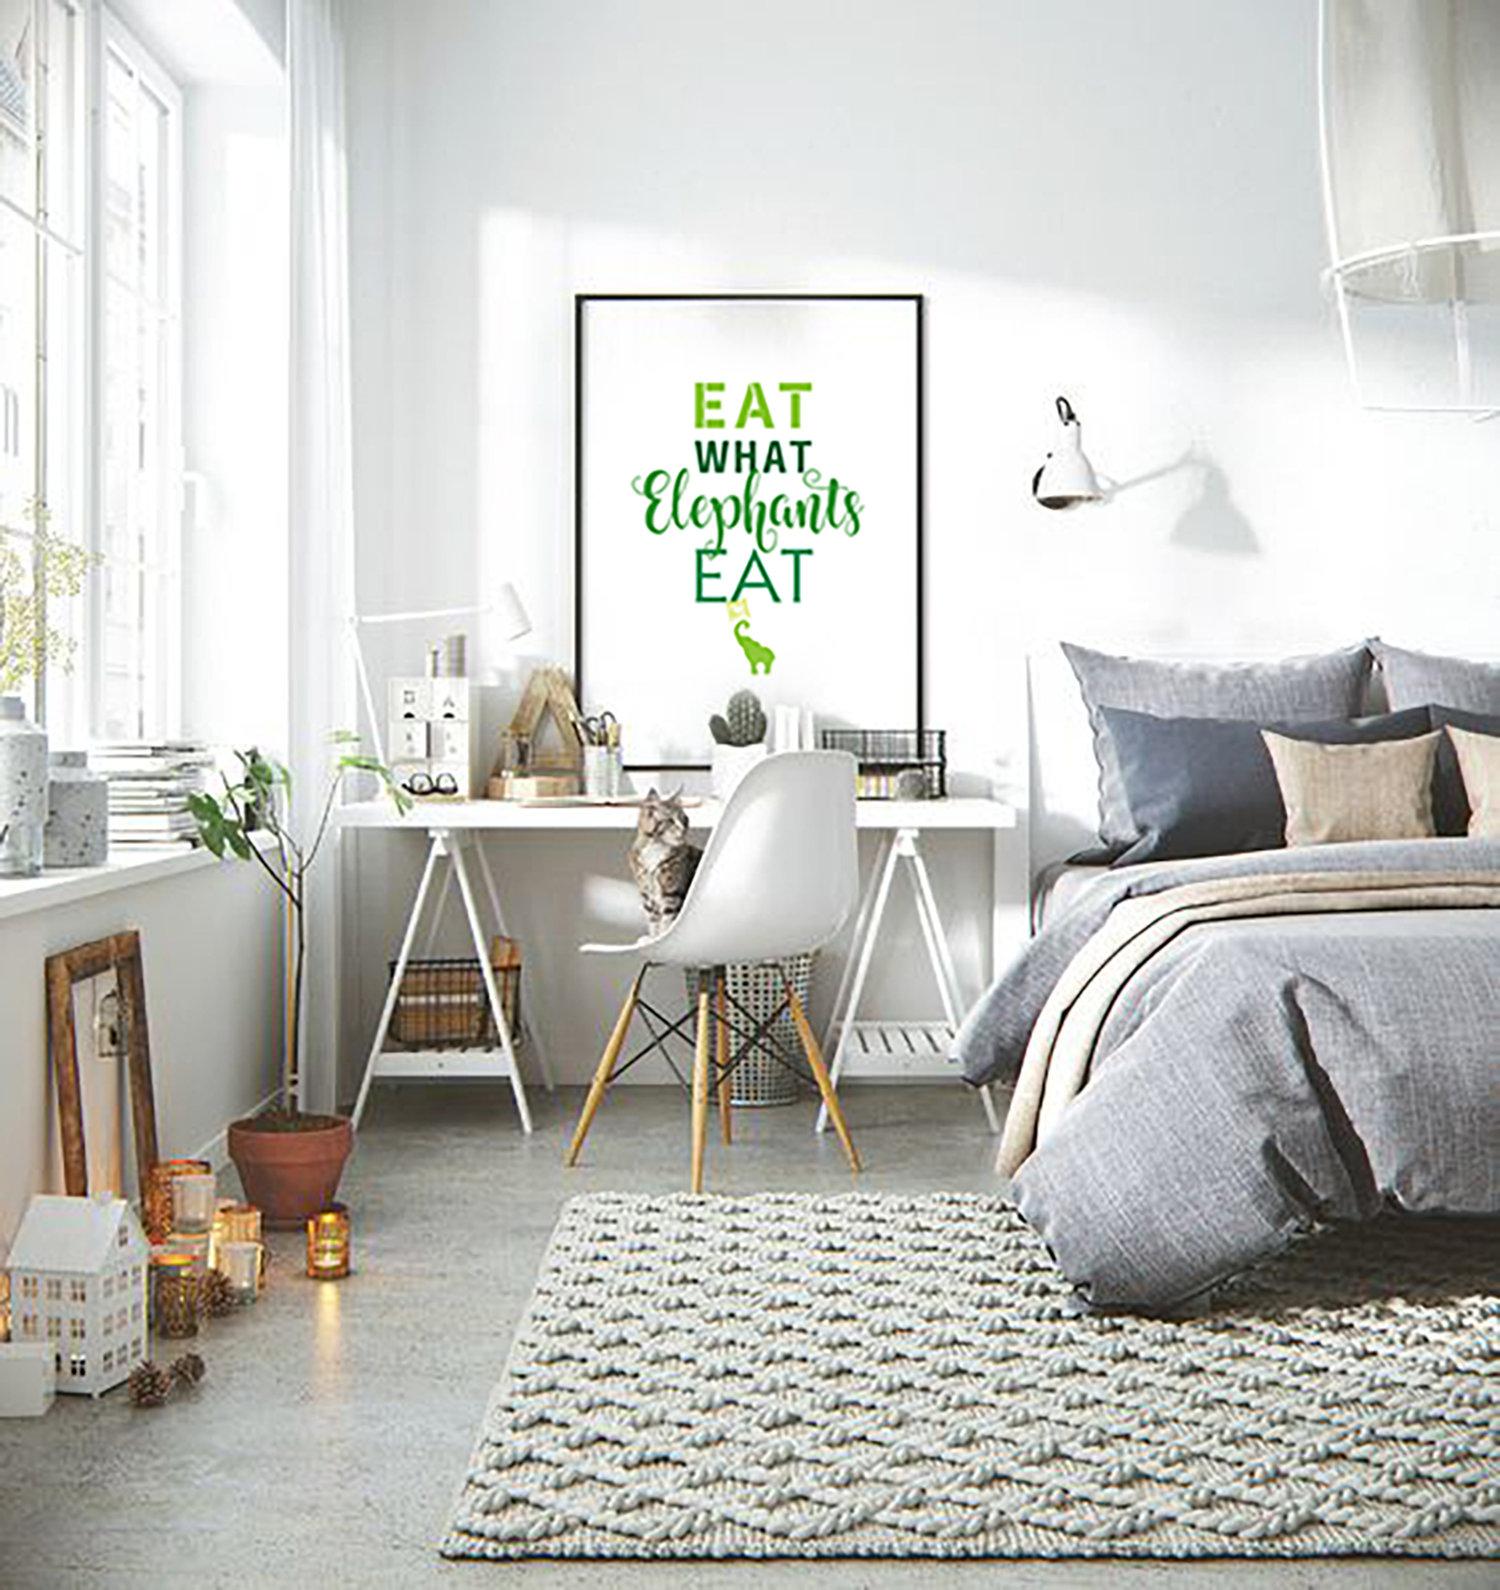 eat+like+elephant+interior+copy.jpg